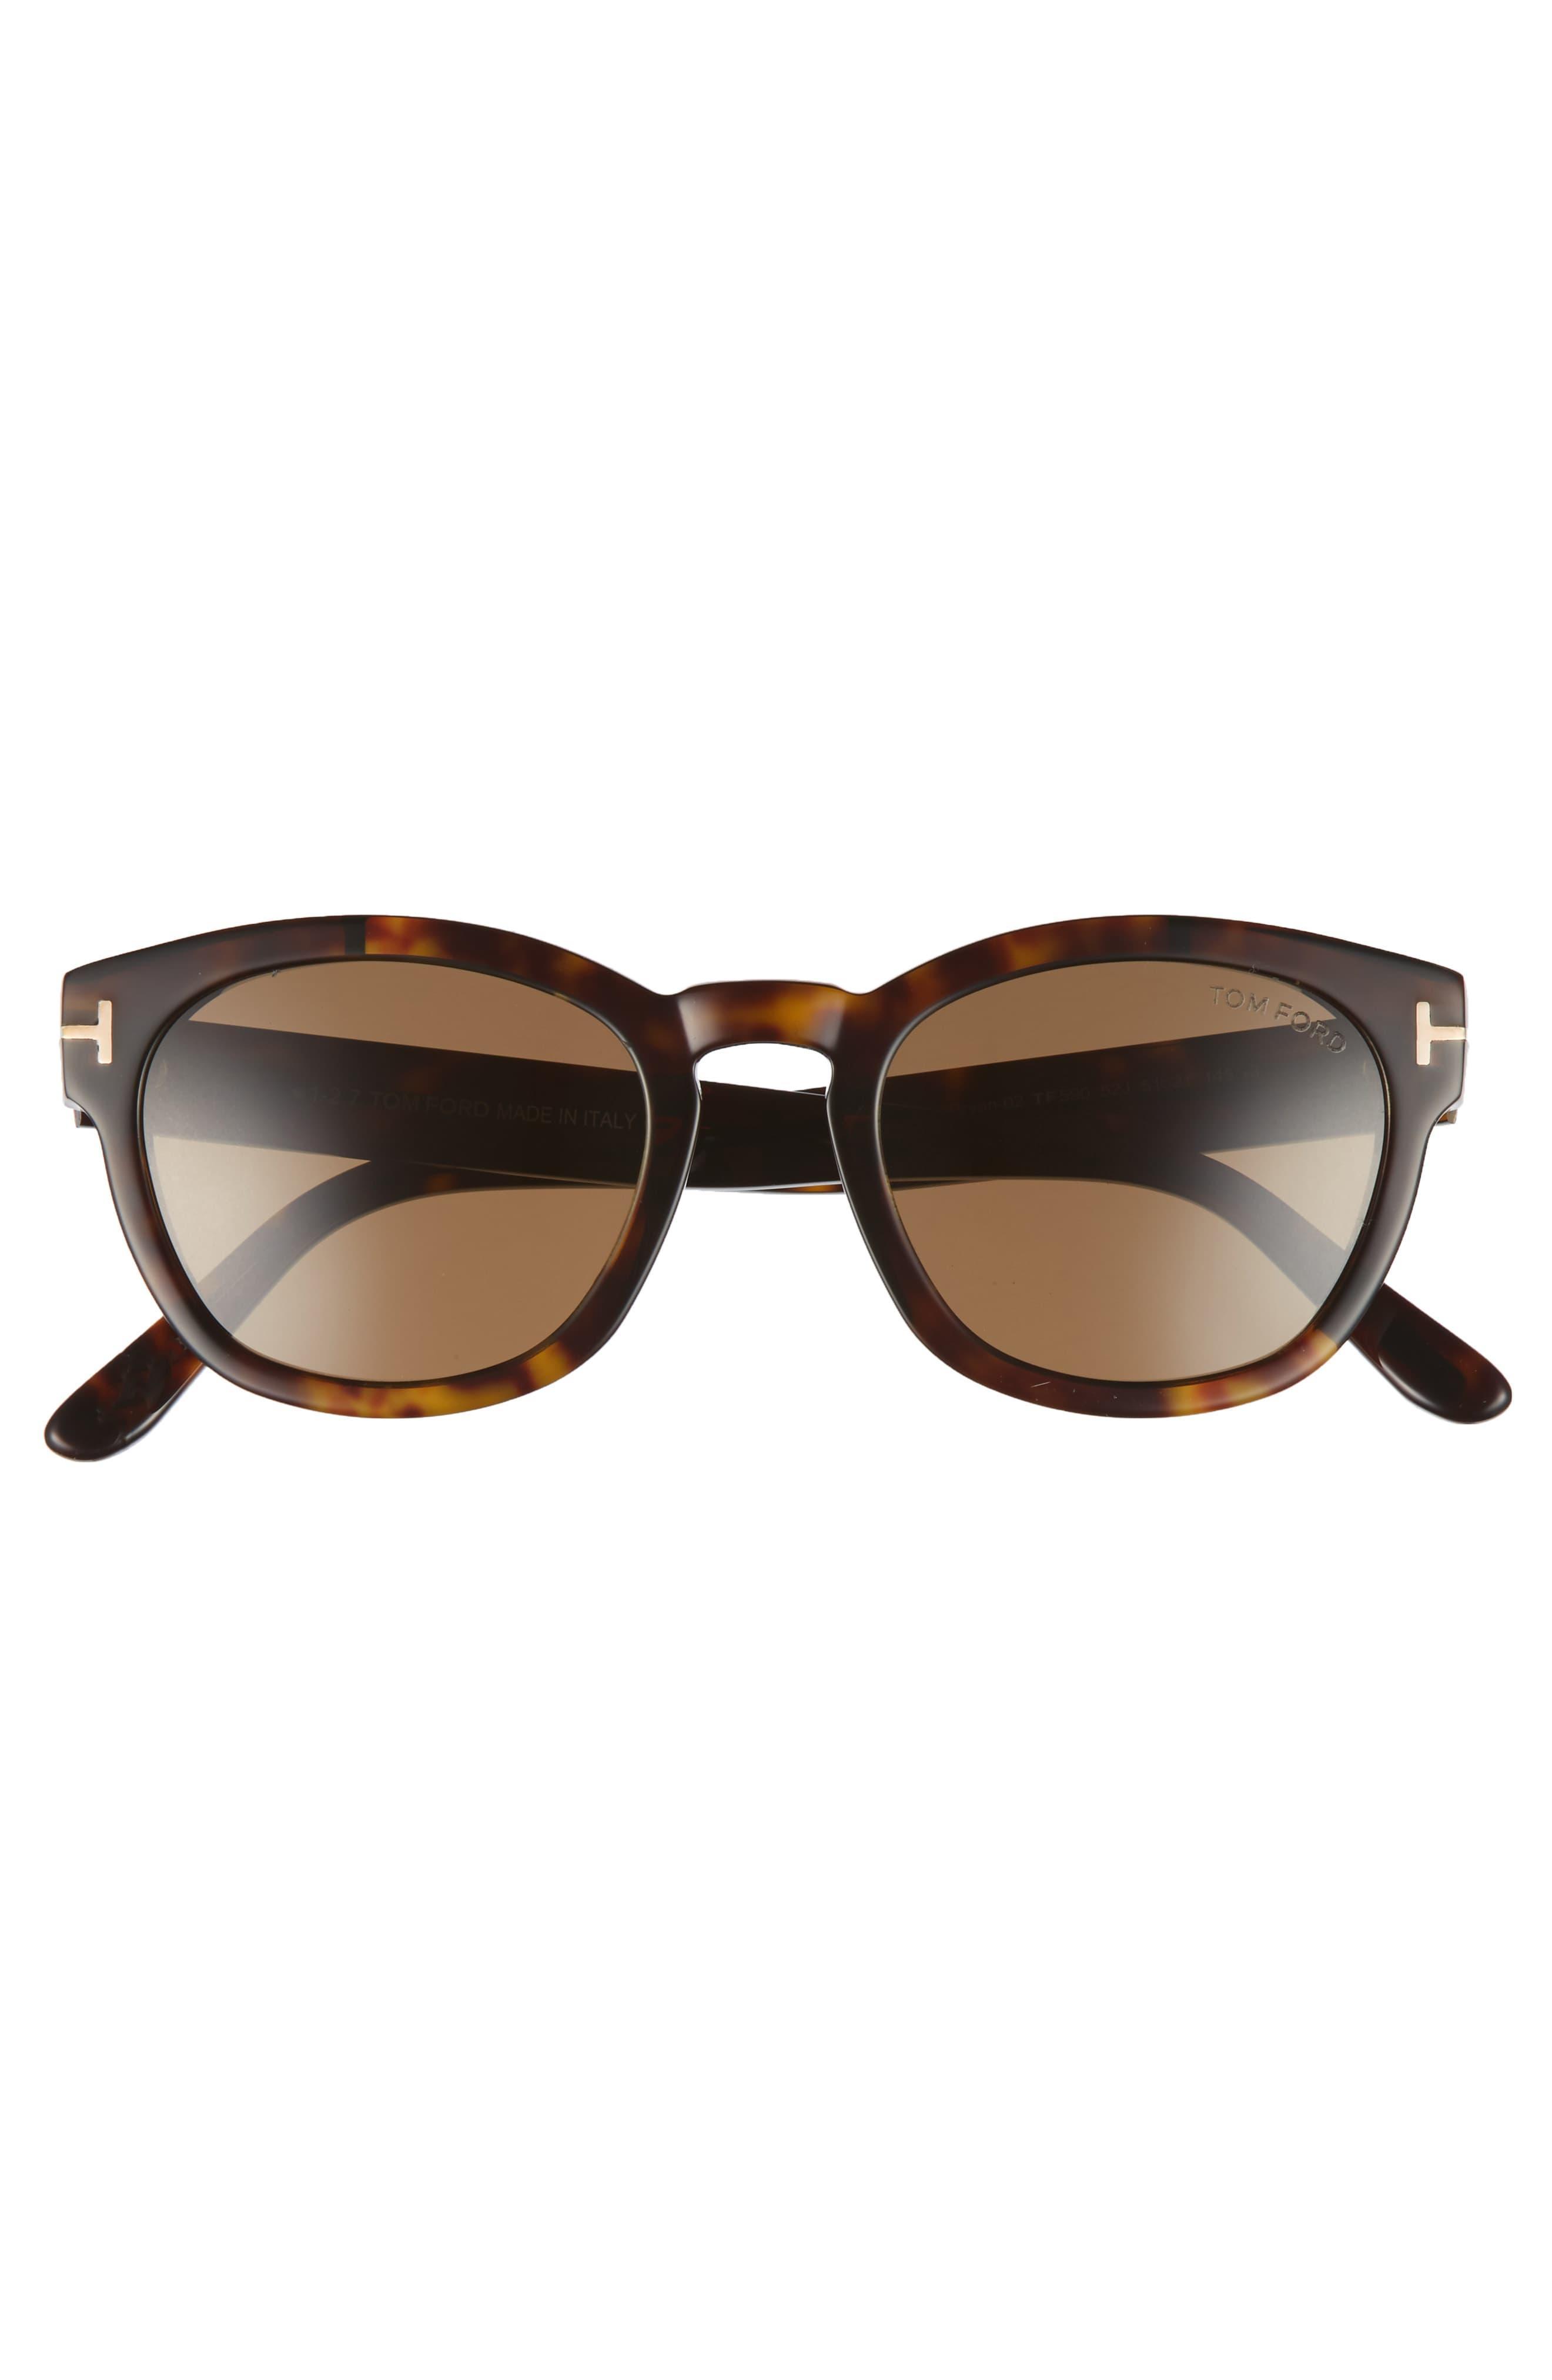 a850e2a5db Tom Ford - Brown Bryan 51mm Sunglasses - Dark Havana  Roviex for Men - Lyst.  View fullscreen